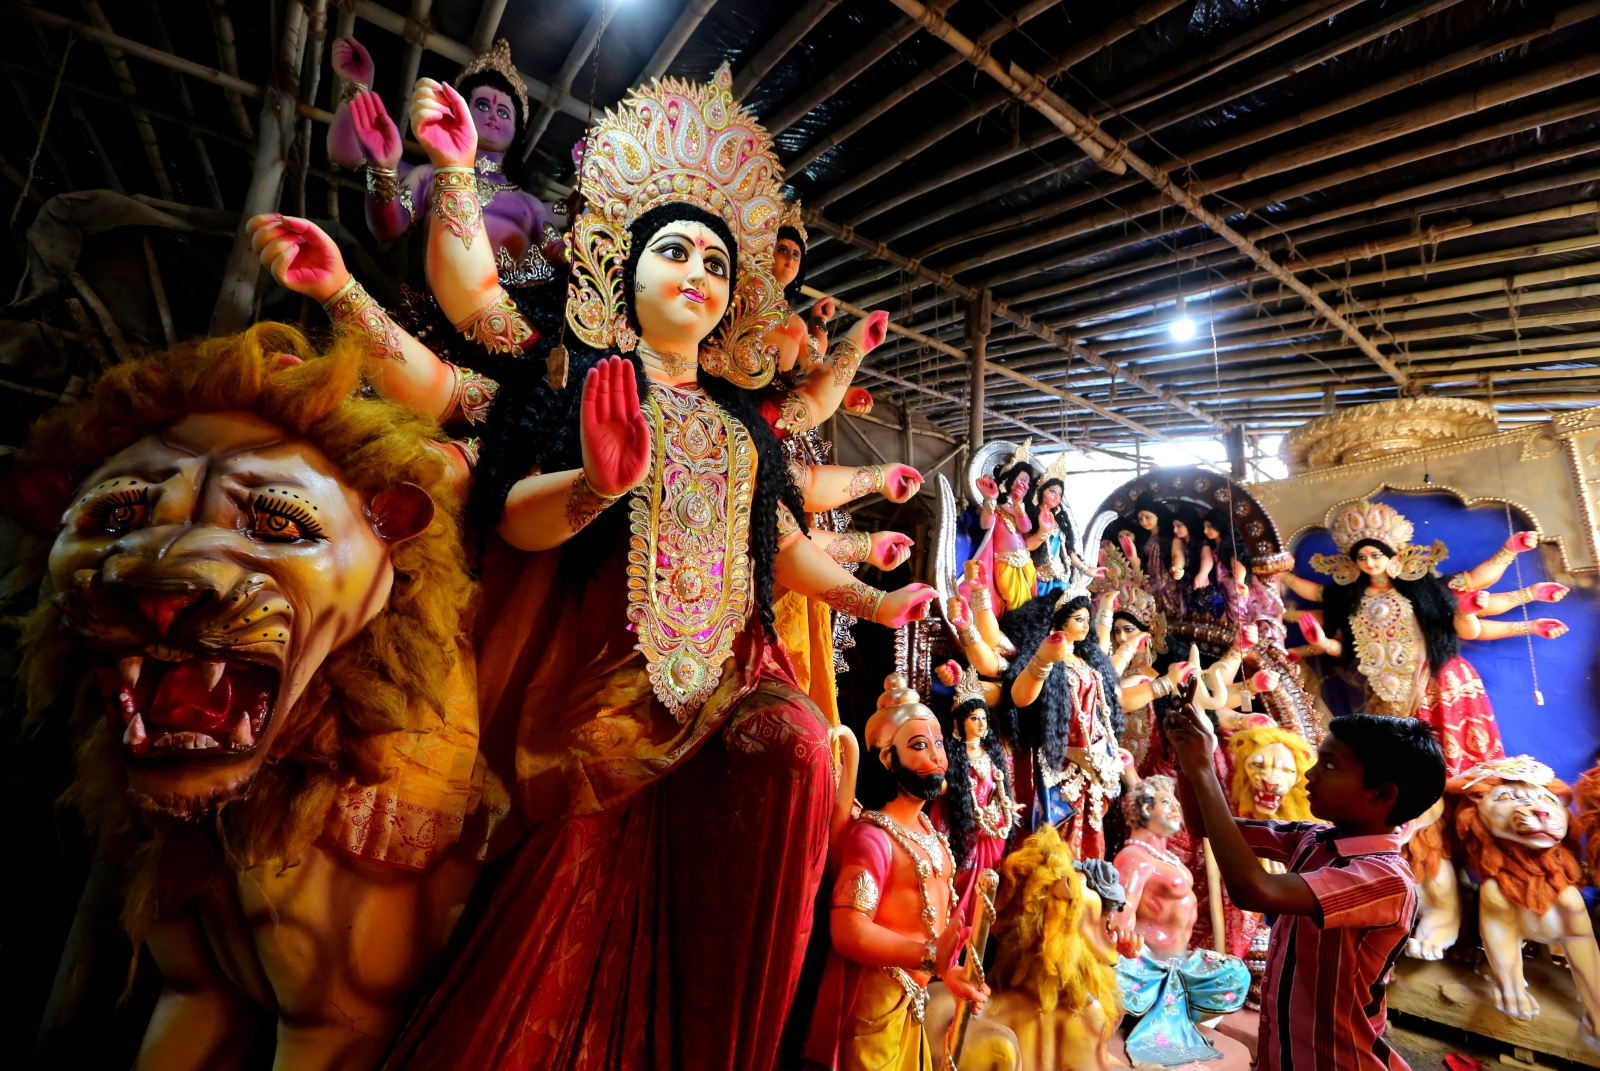 Festiwal Durga Puja w Bhopal, Indie